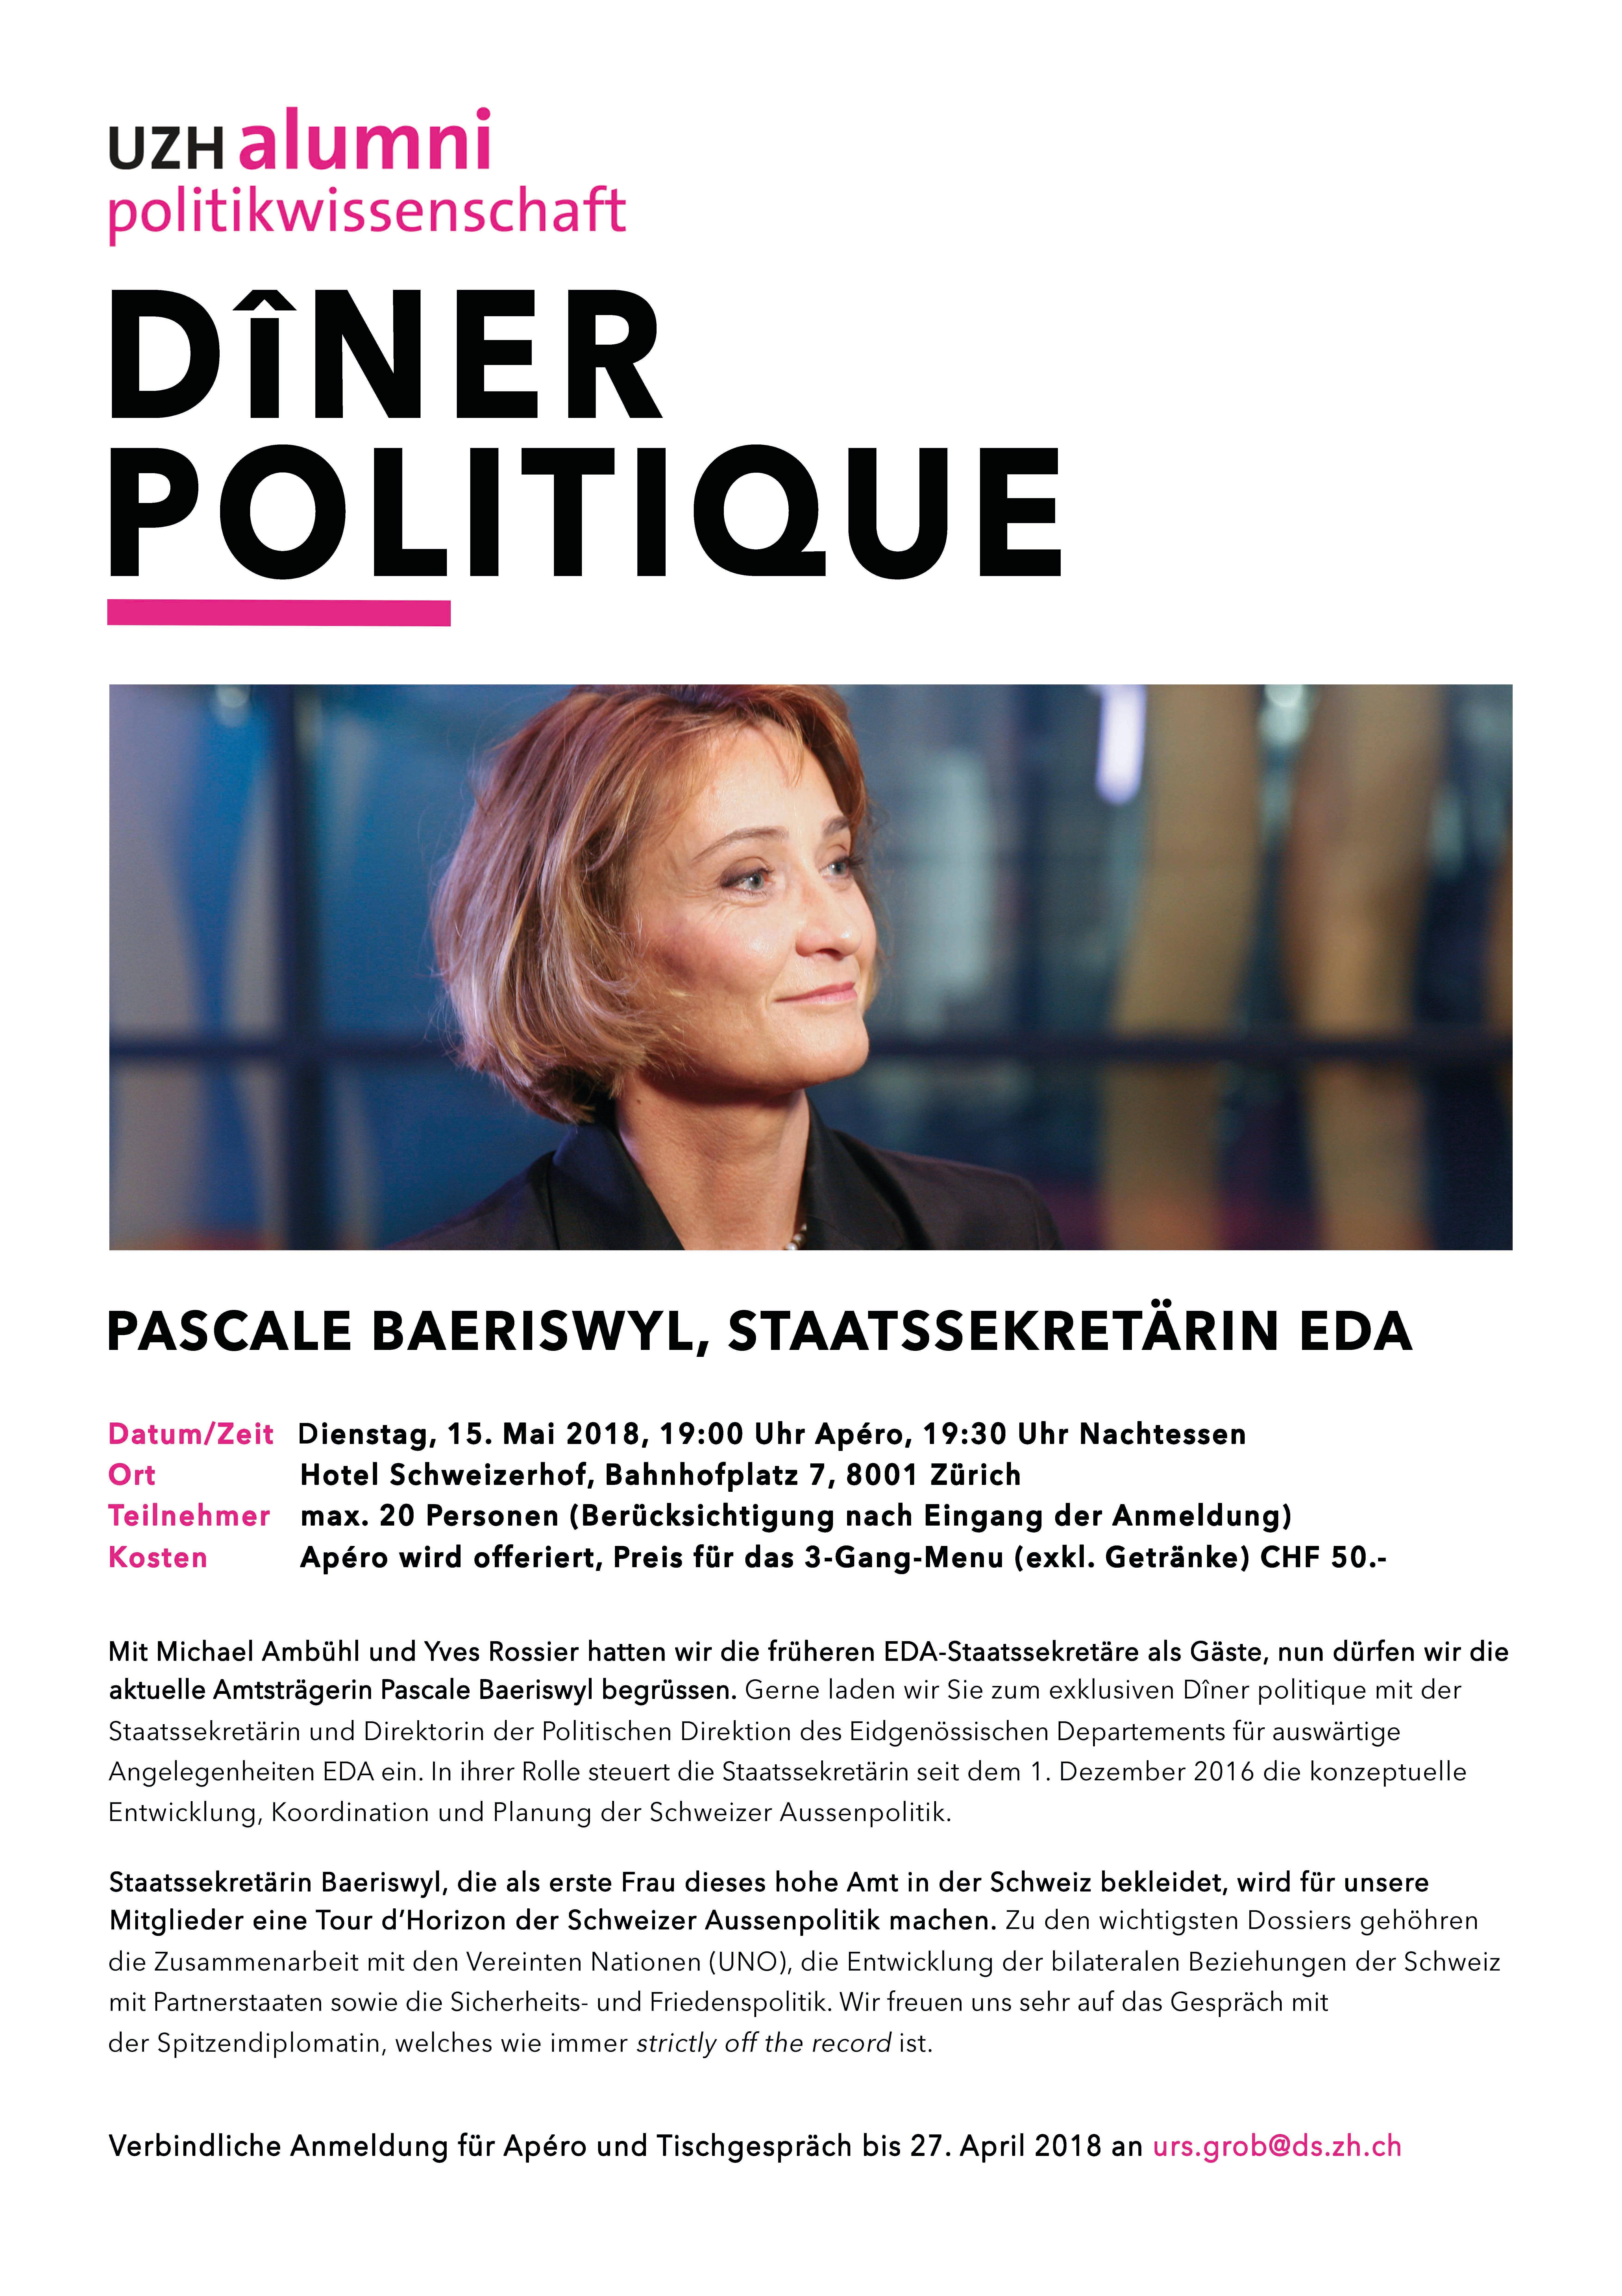 Pascale Baeriswyl